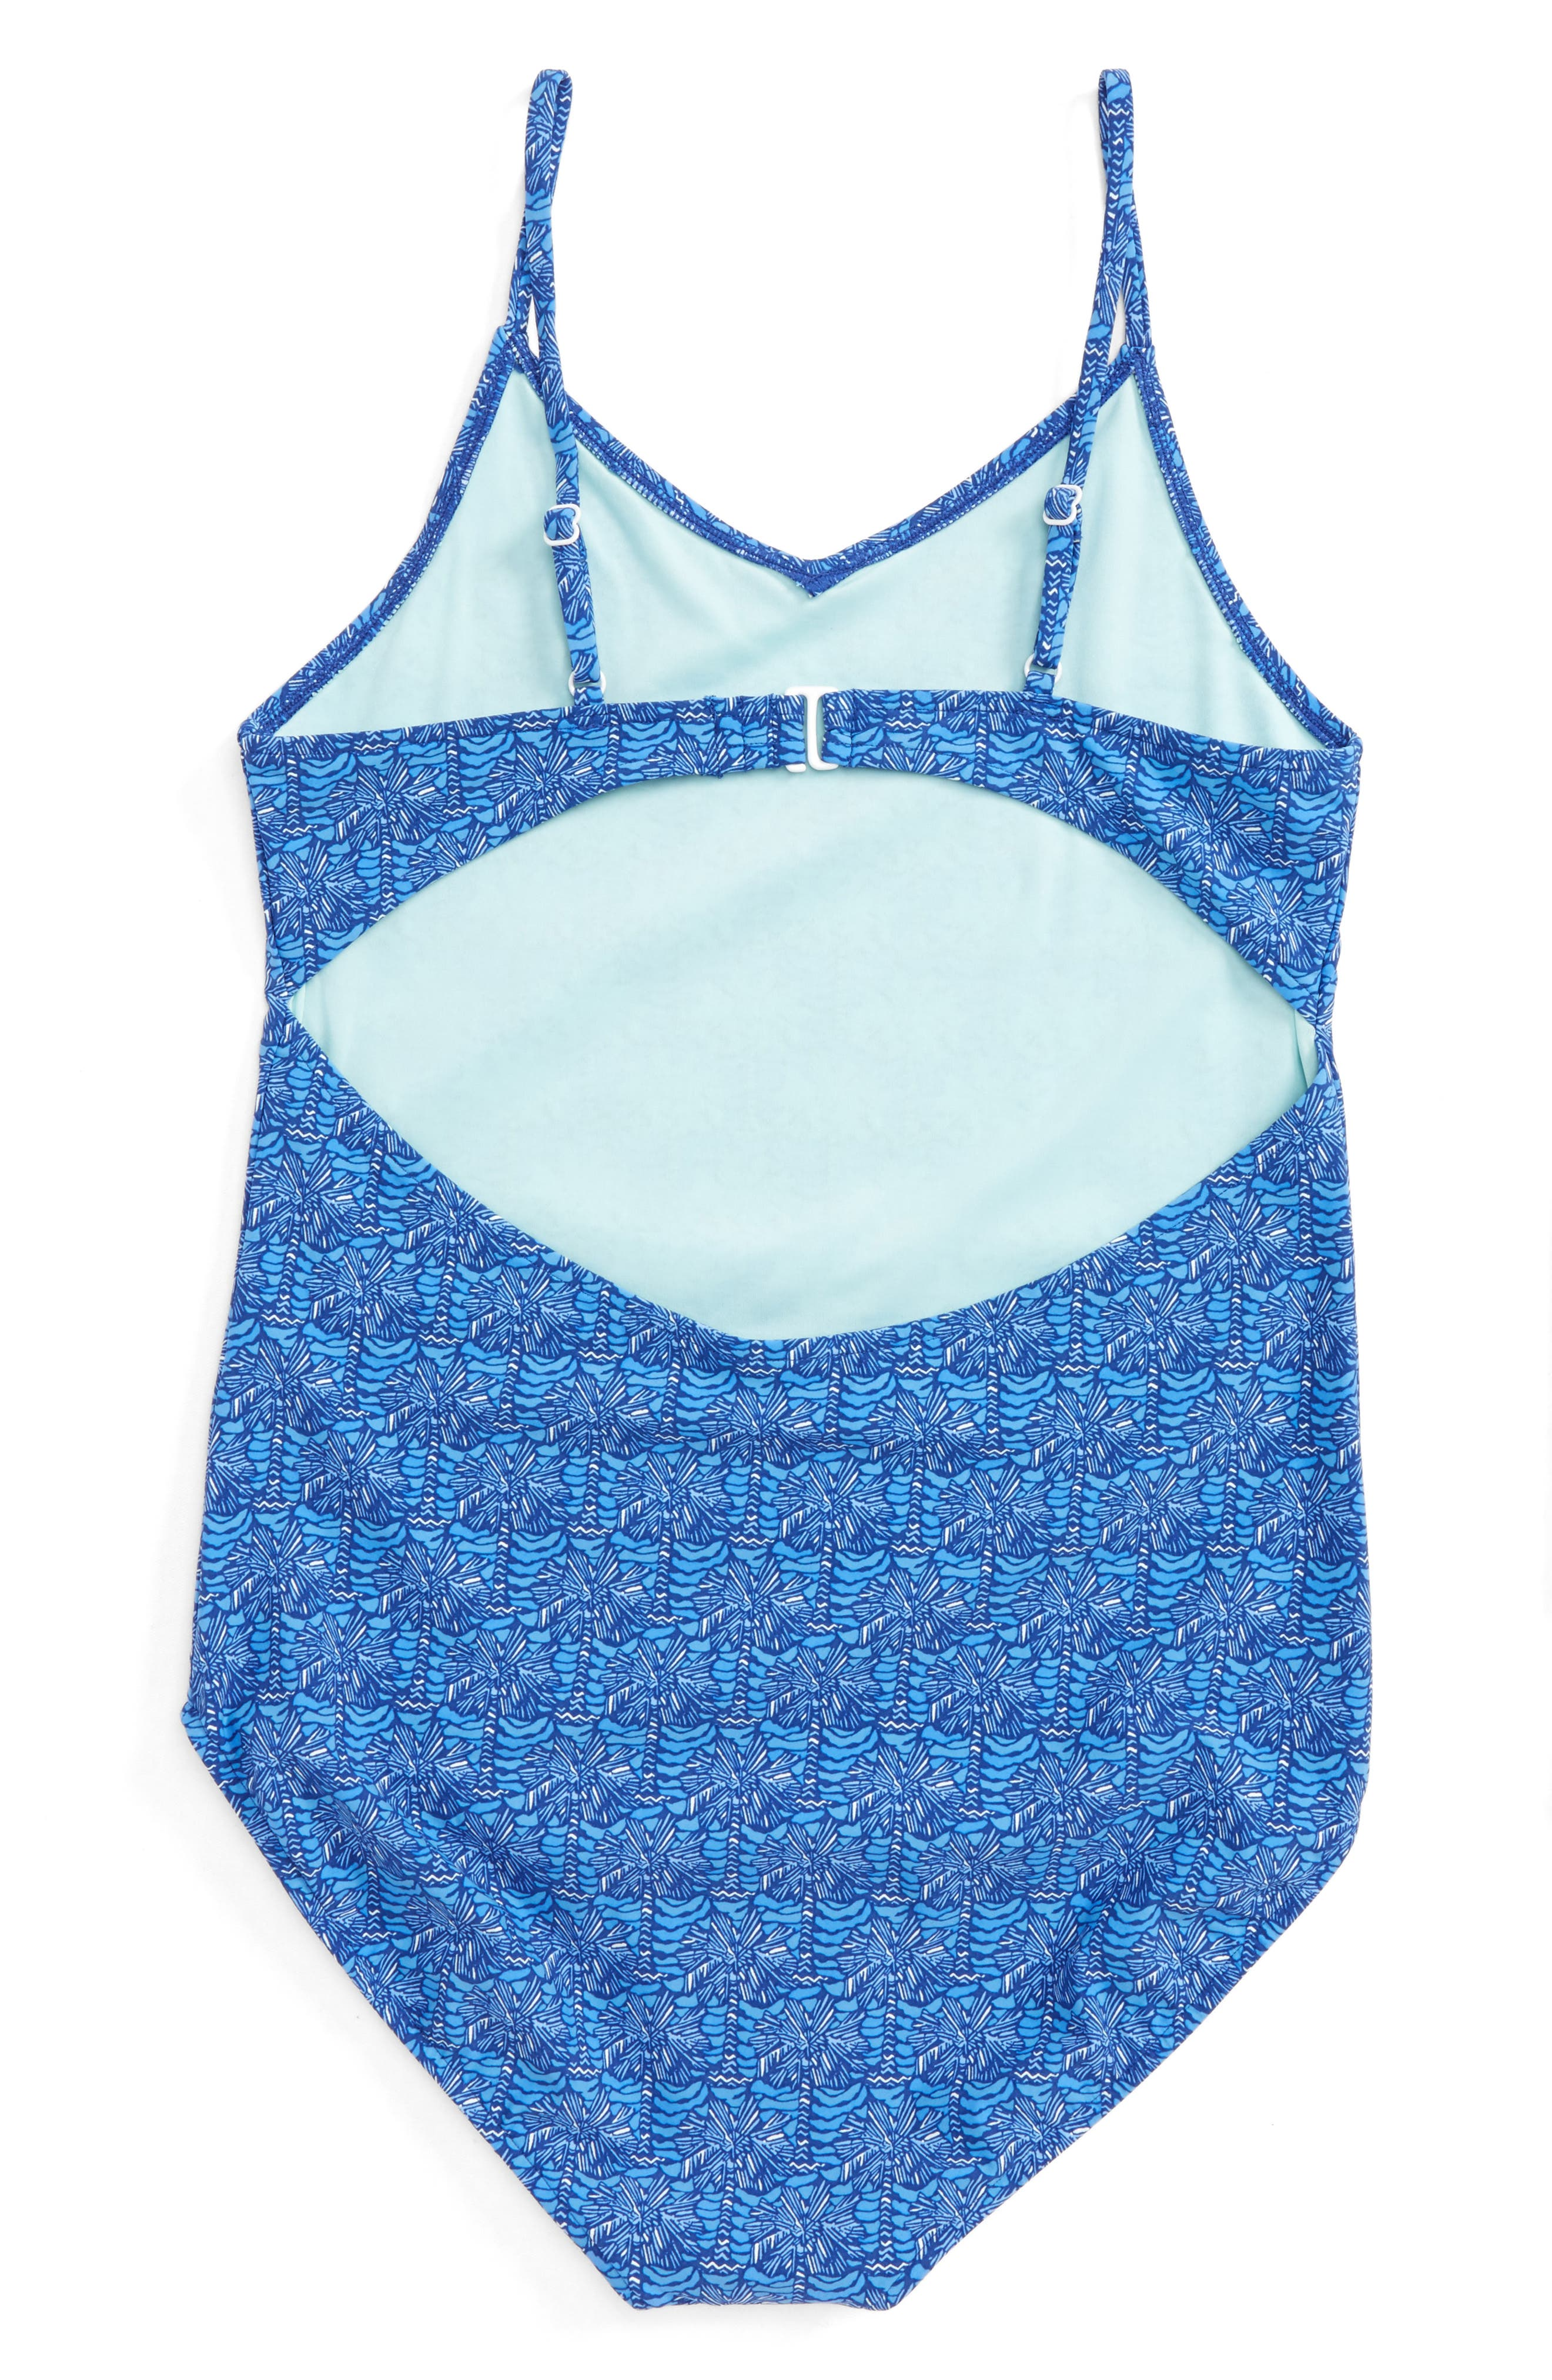 Alternate Image 2  - vineyard vines Palmetto Print One-Piece Swimsuit (Little Girls & Big Girls)